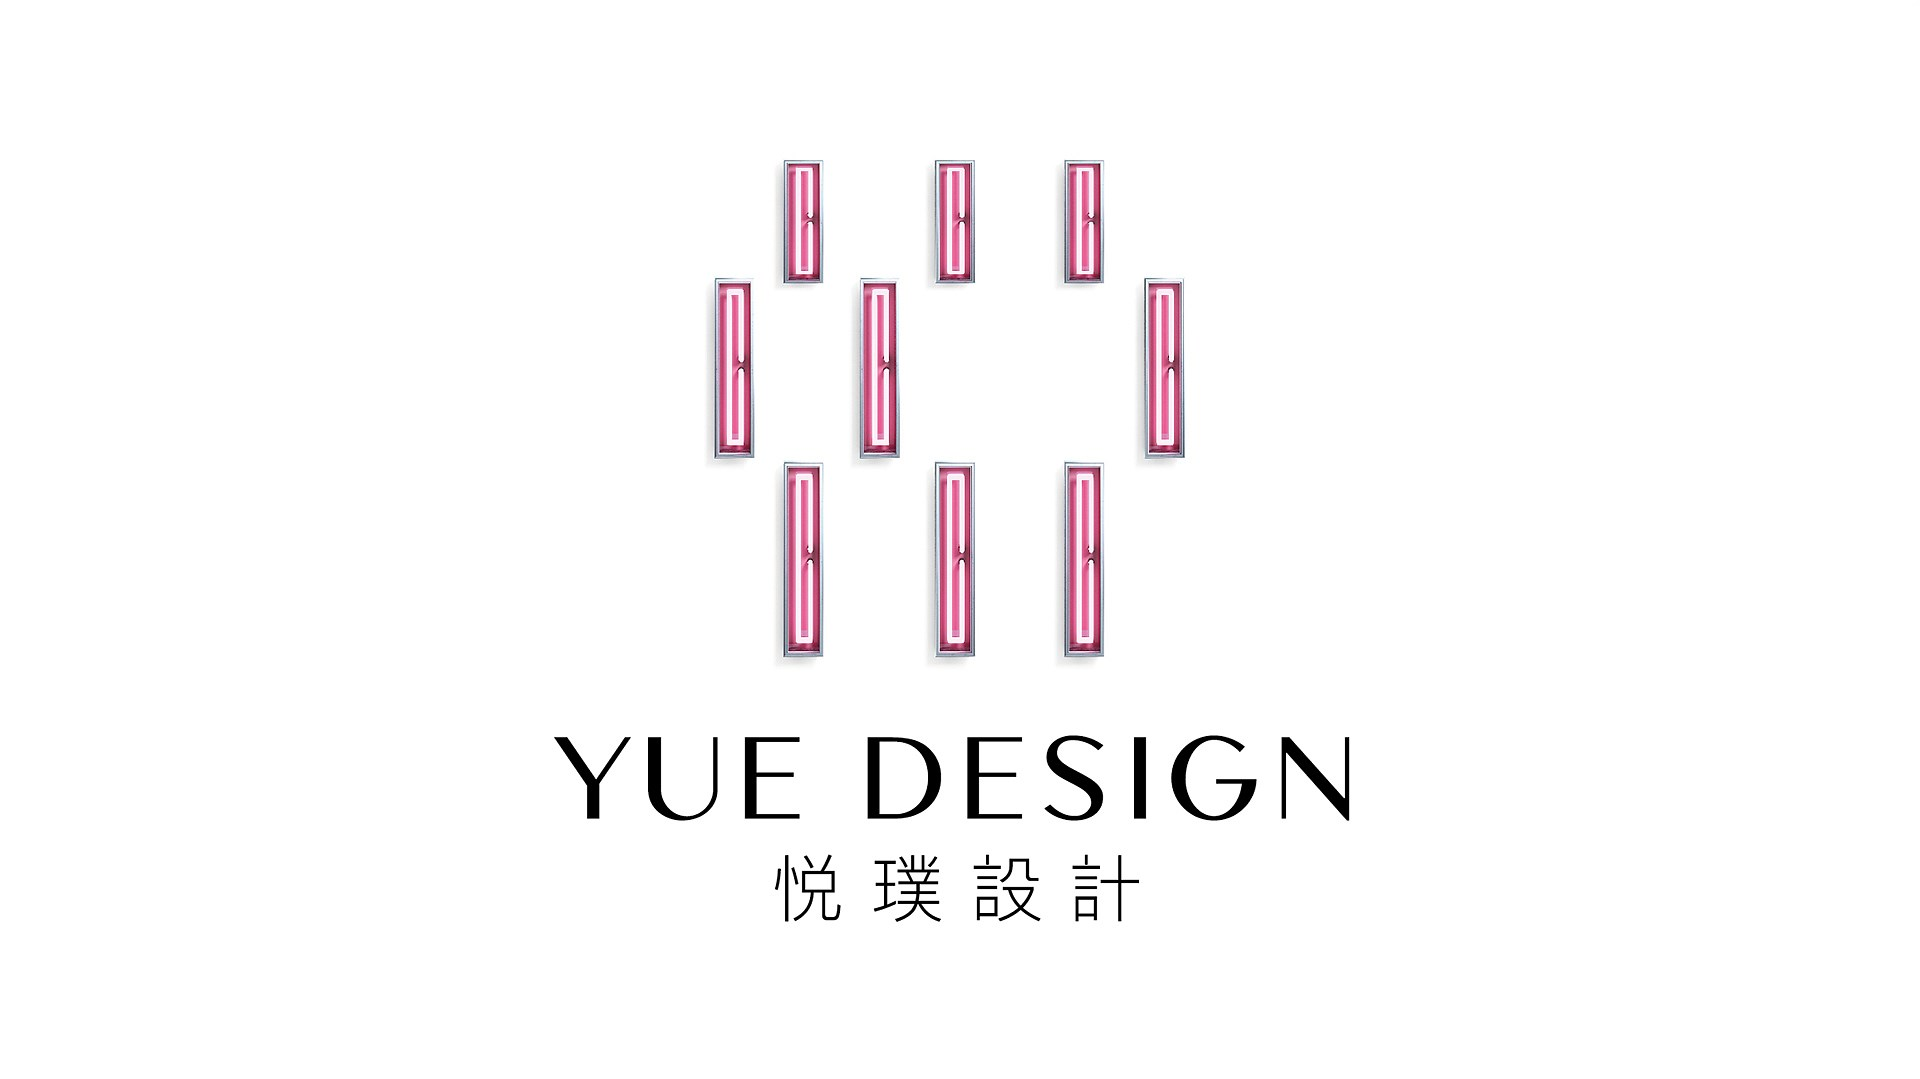 yue_web-07.jpg